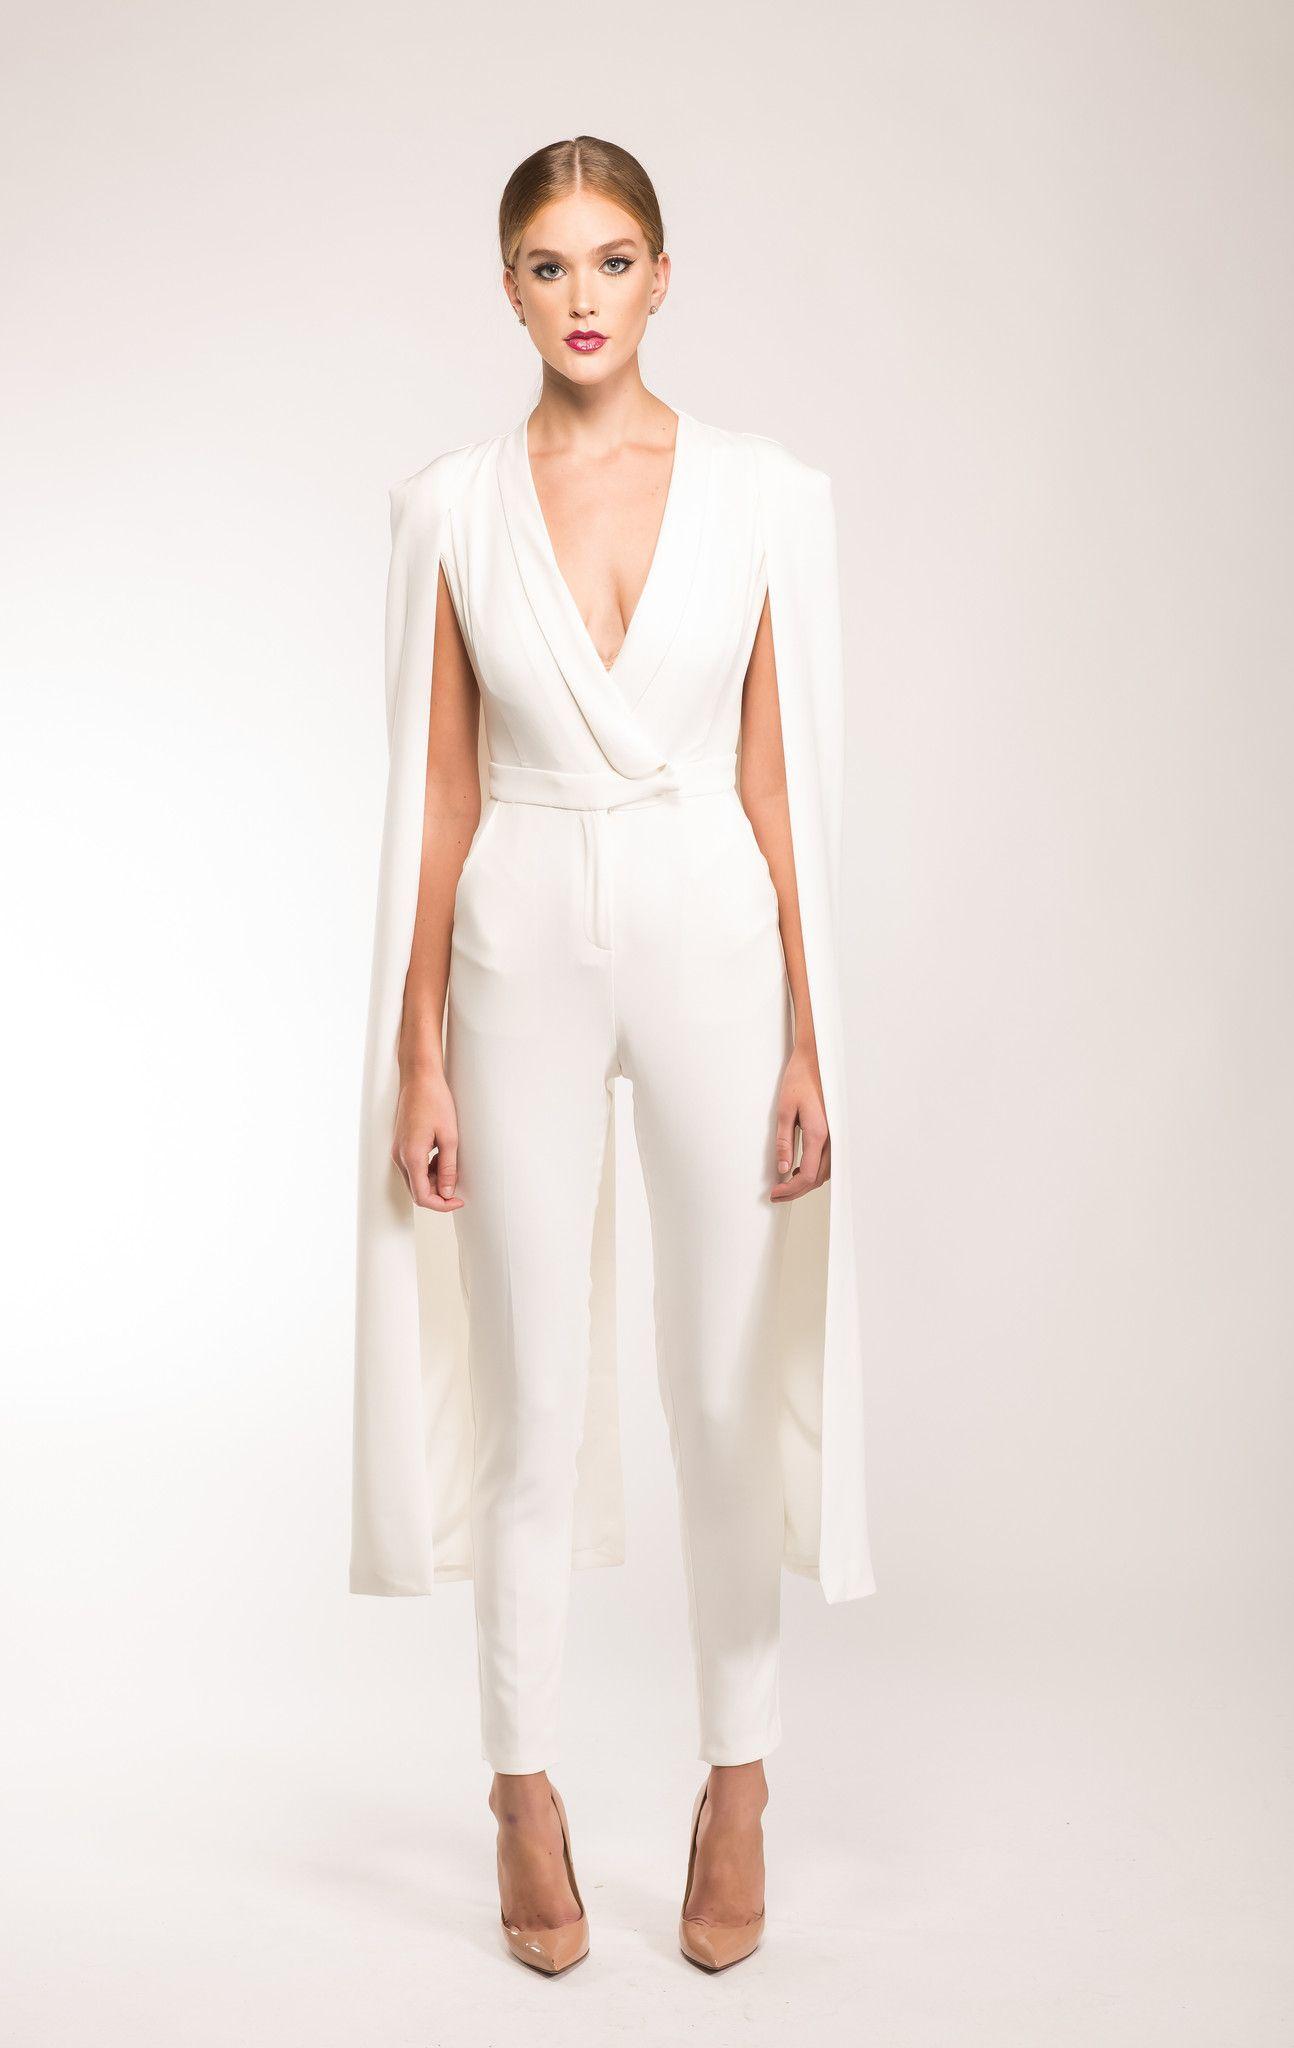 Off the Shoulder White Ankle Length Jumpsuit - USD $22.37 ...